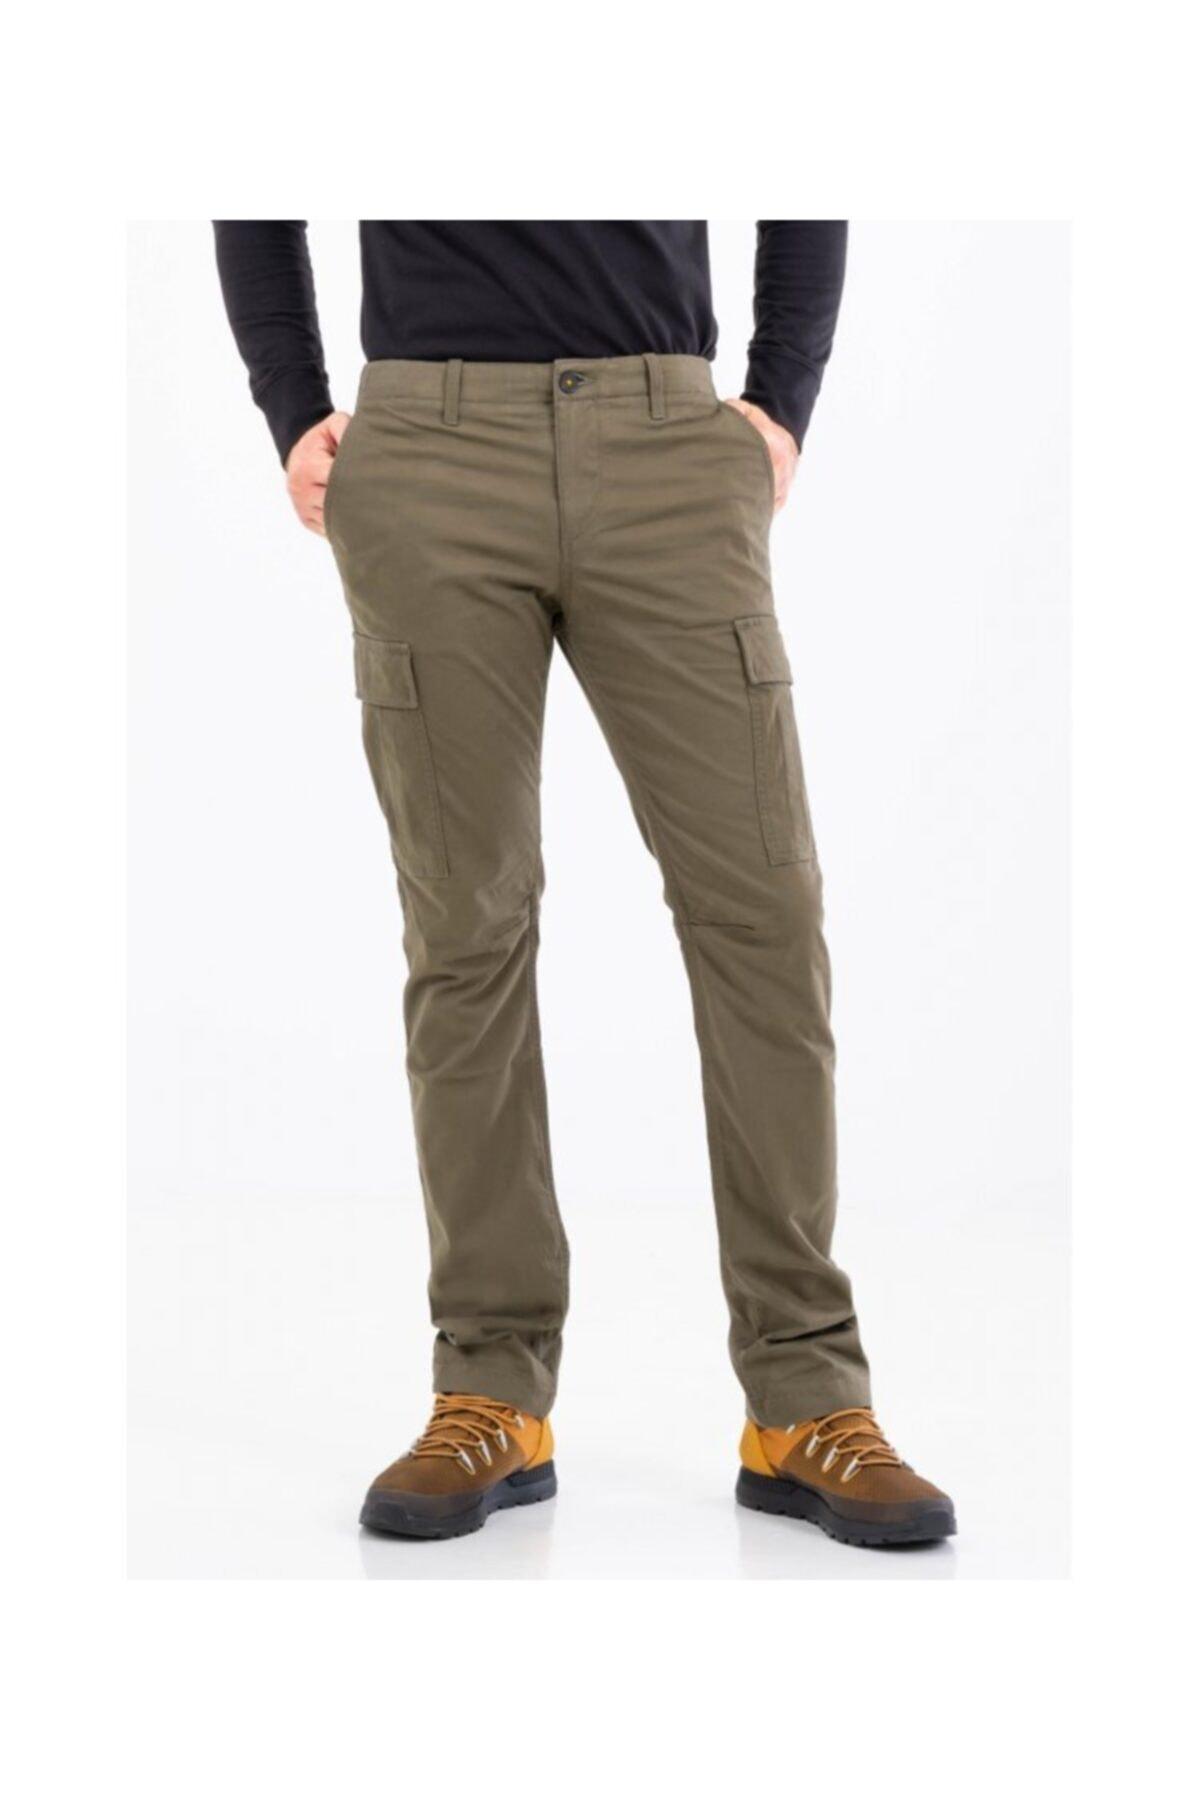 Timberland Core Twill Cargo Erkek Pantolon Bej 2